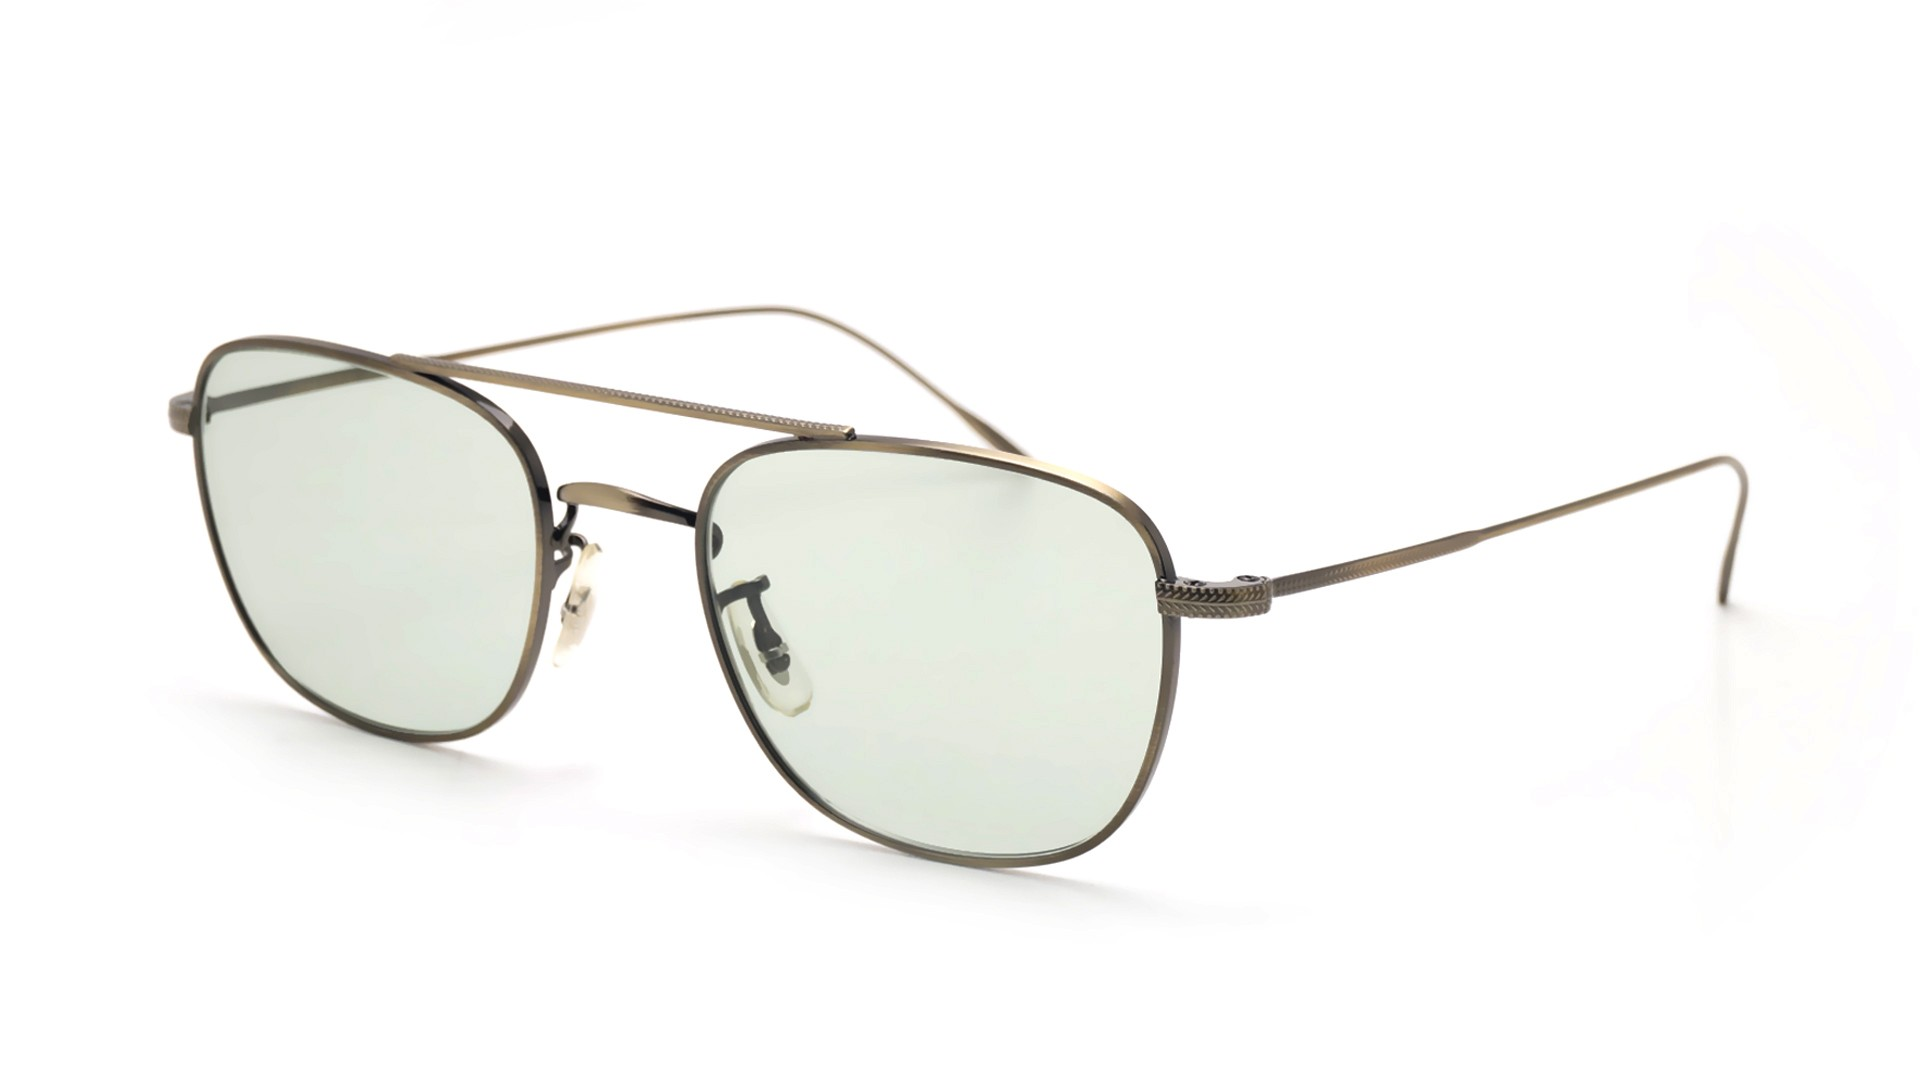 46f00f0edf Sunglasses Oliver Peoples Kress Bronze OV1238 5284 49-19 Medium